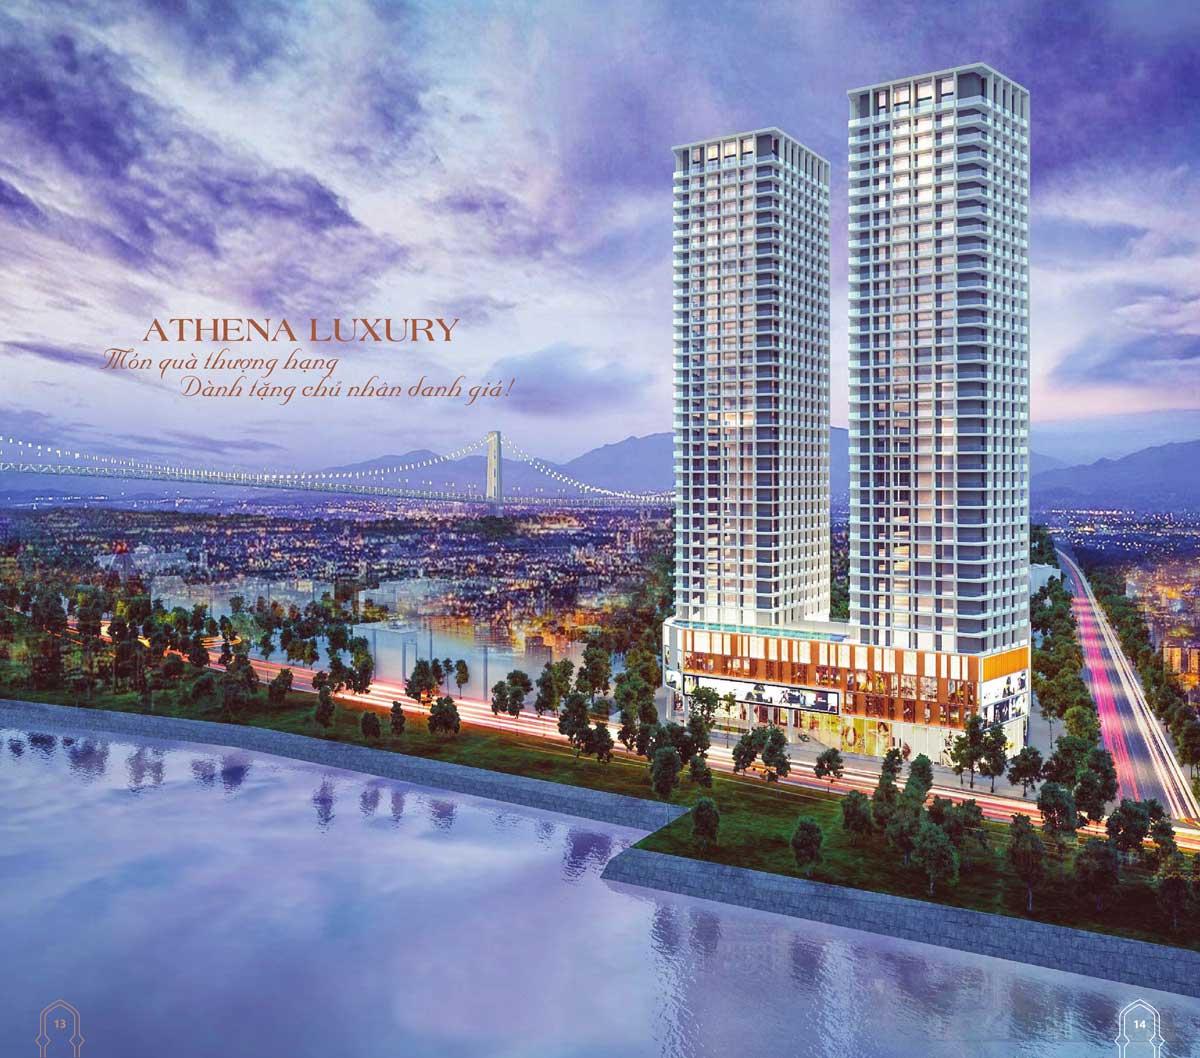 athena luxury da nang - Athena Luxury Đà Nẵng Riverside